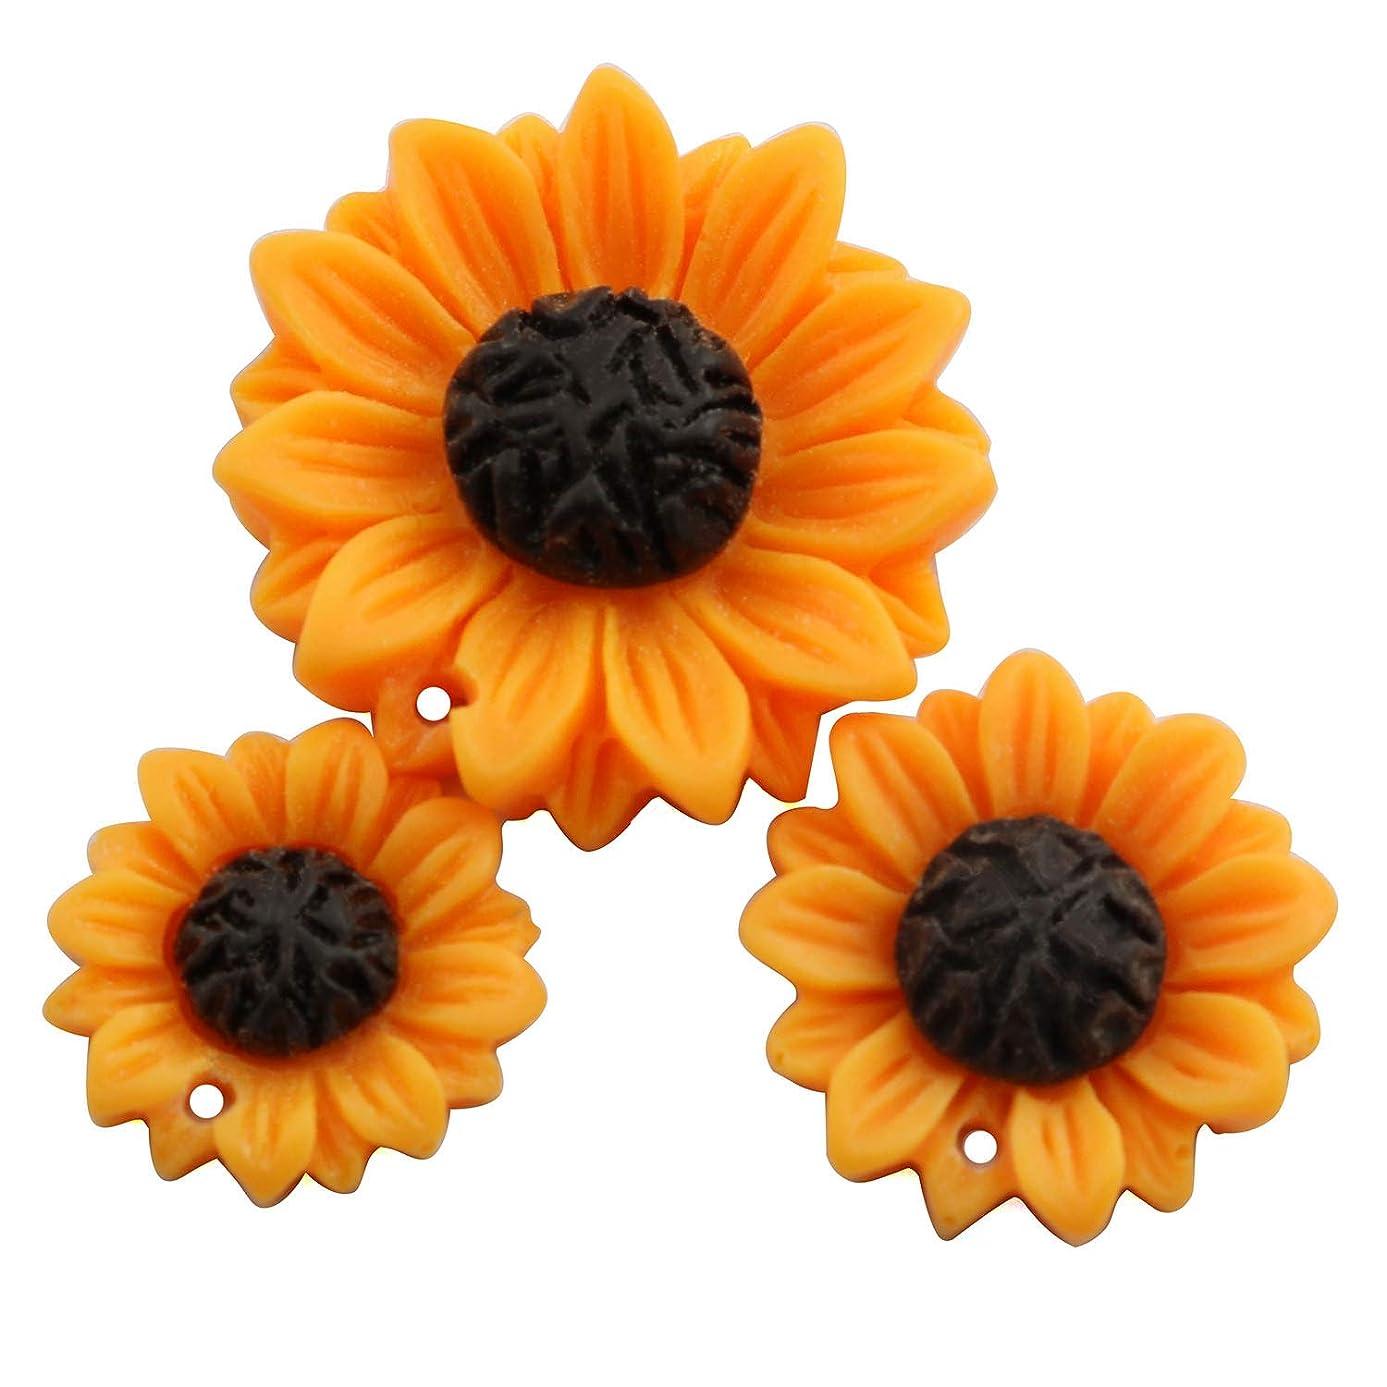 NX Garden 12PCS Orange Sunflower Girasoles Daisy Flowers Resin Flatback Cabochon with Hole for Necklace Earrings Ring Bracelet Handmade DYD 3 Size